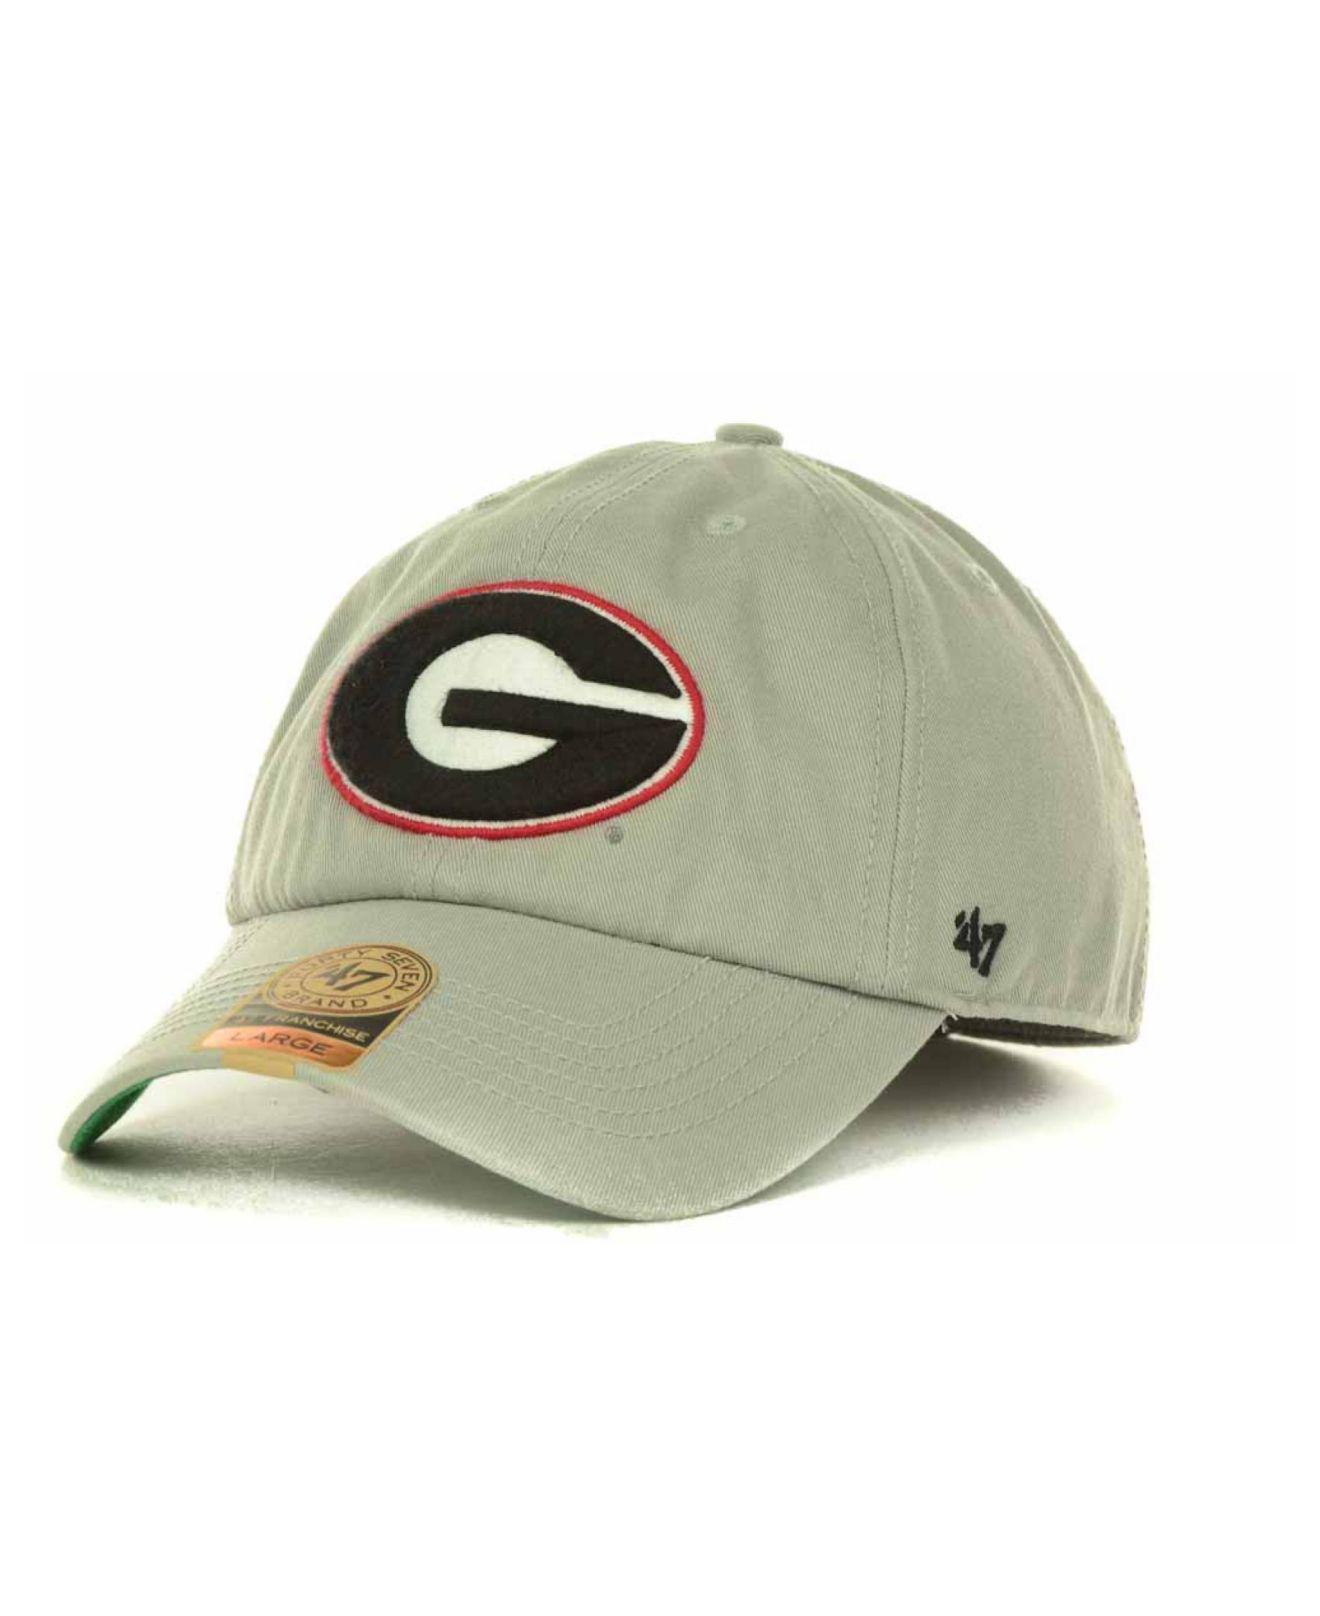 a320906fb59 Lyst - 47 Brand Georgia Bulldogs Franchise Cap in Gray for Men